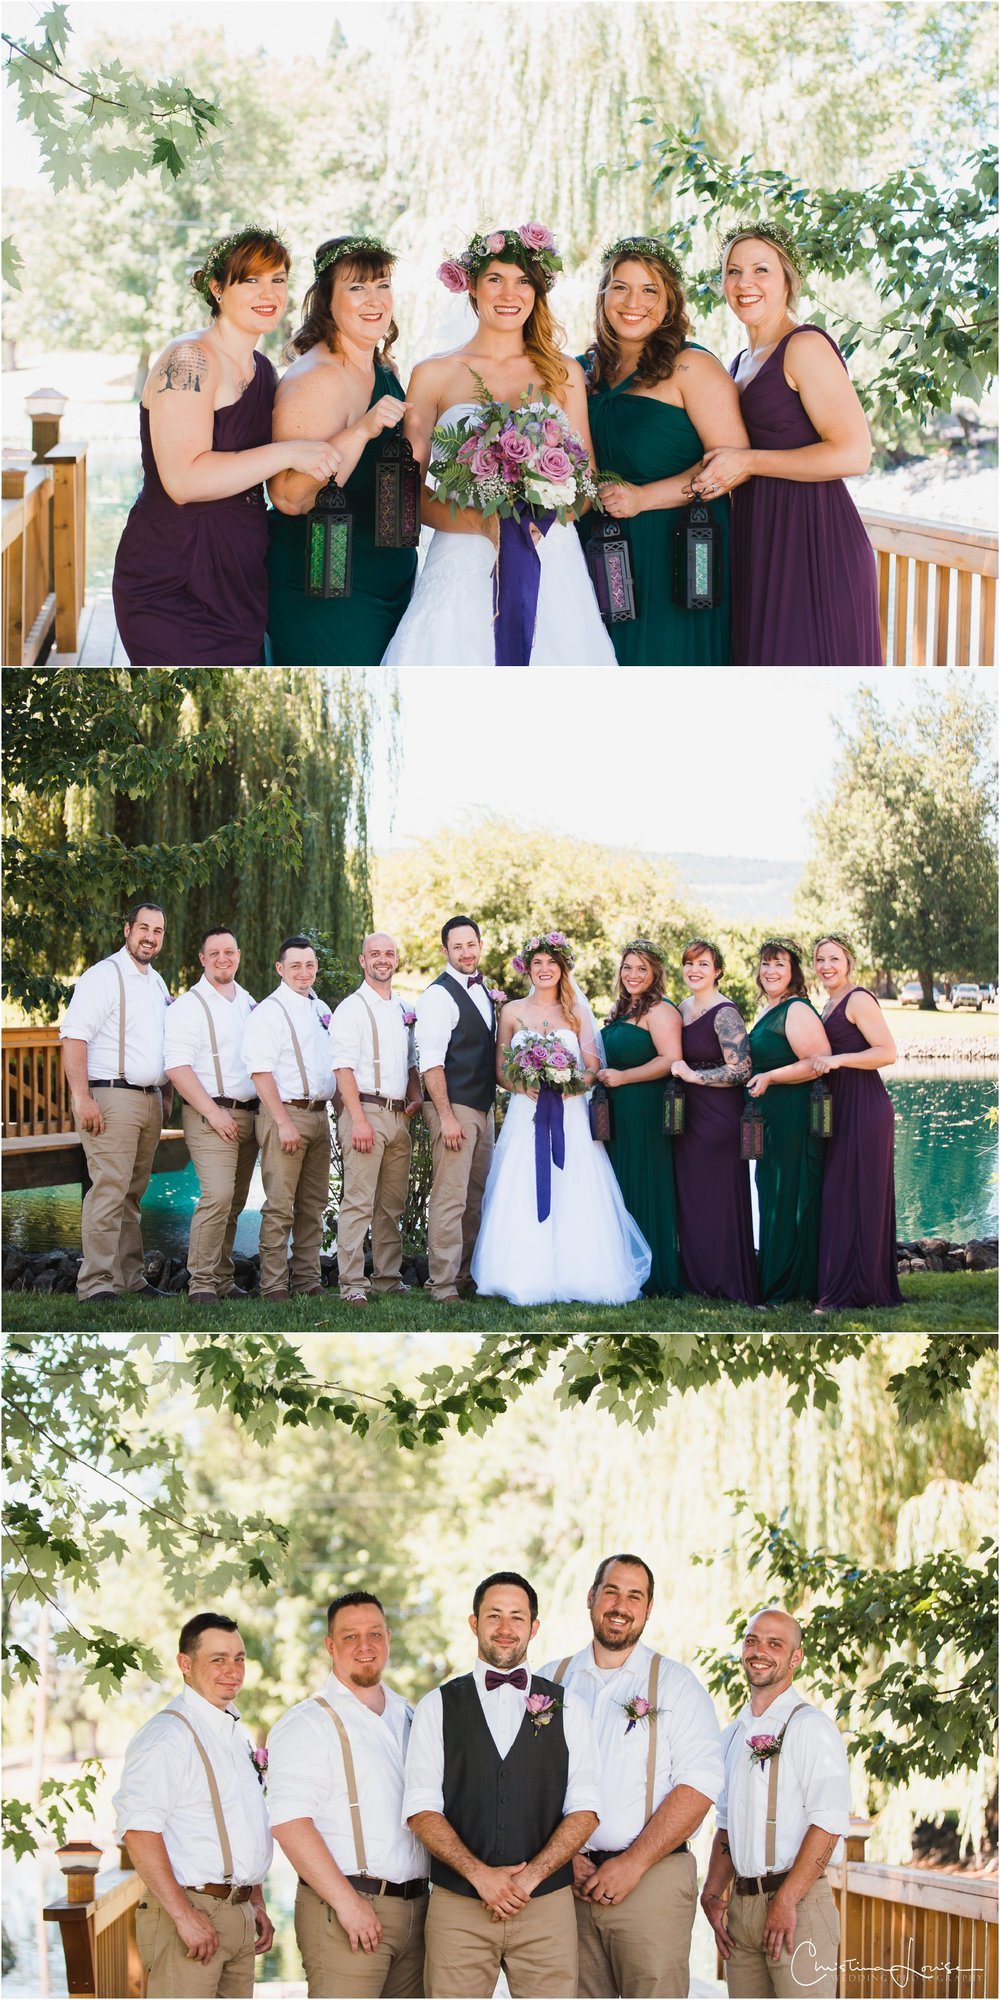 Top: Candace w/bridesmaids Madonna, Brittany, Cindy & Lindsay; Bottom: Groom w/groomsmen Taylor, Steve, Reggie & Joel.